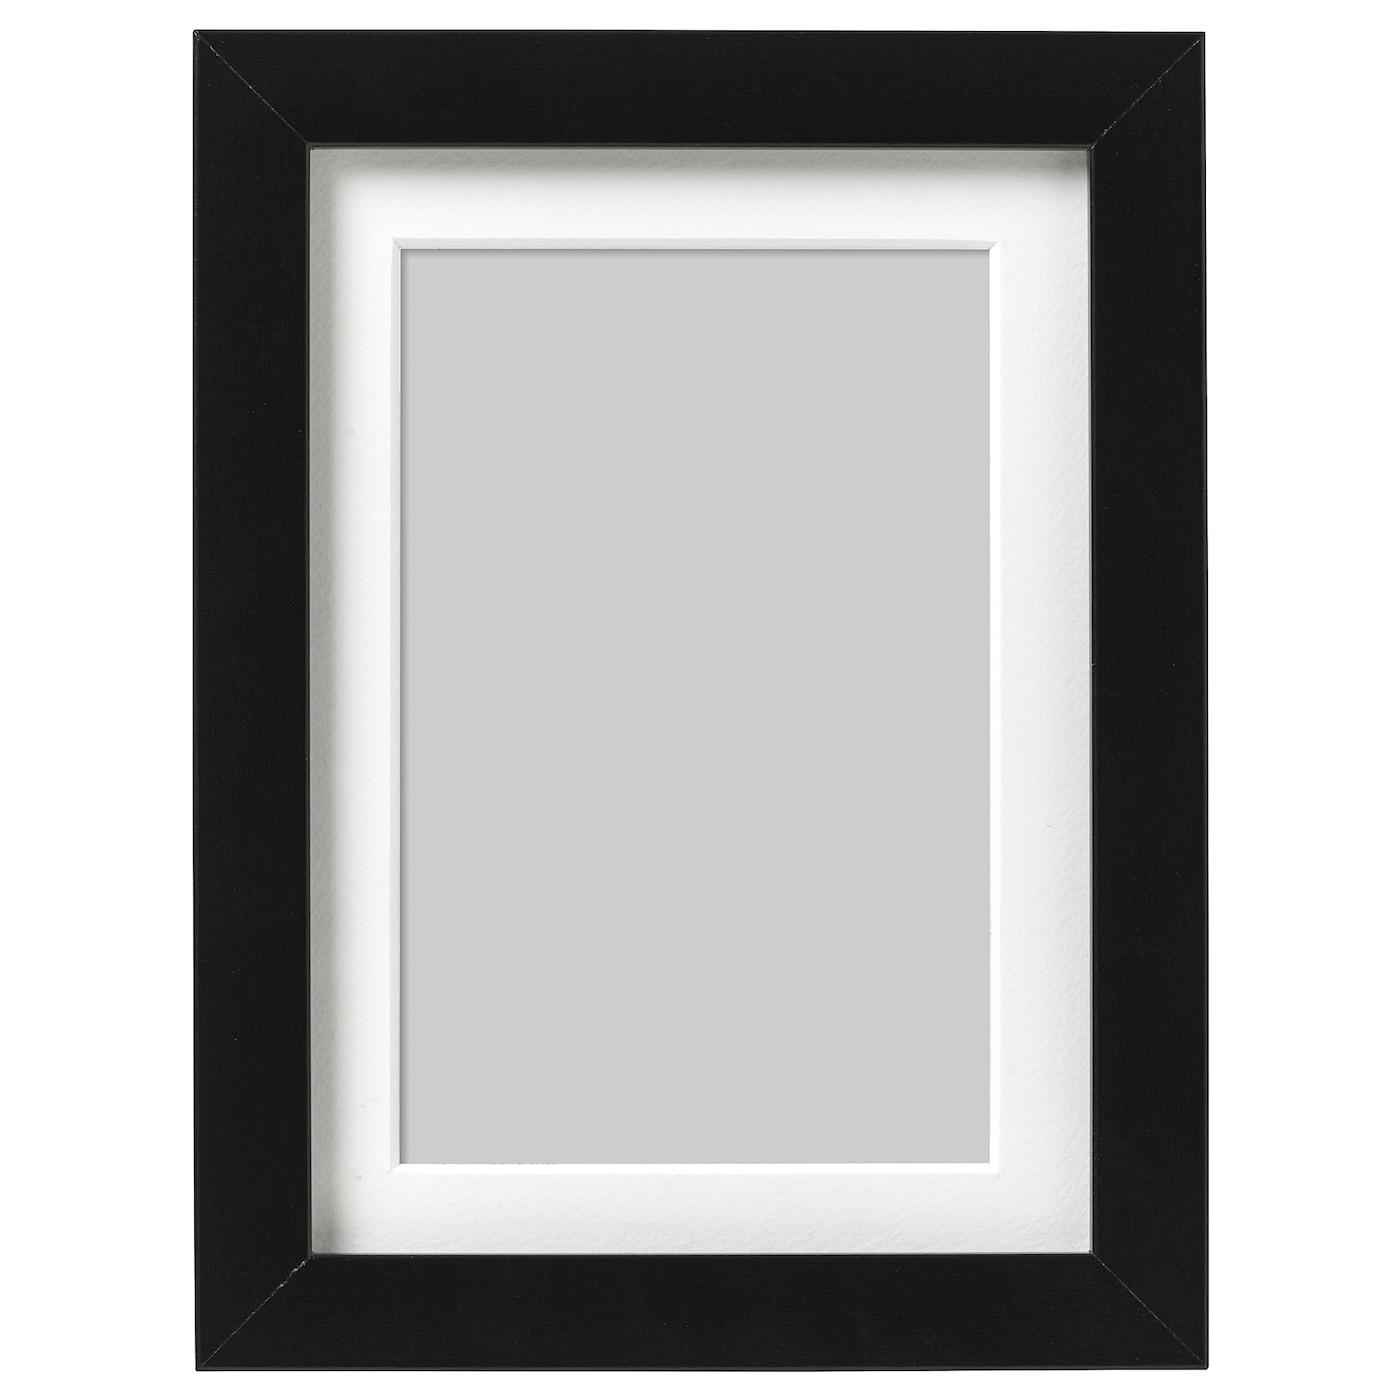 Ribba Frame Black 13x18 Cm Ikea